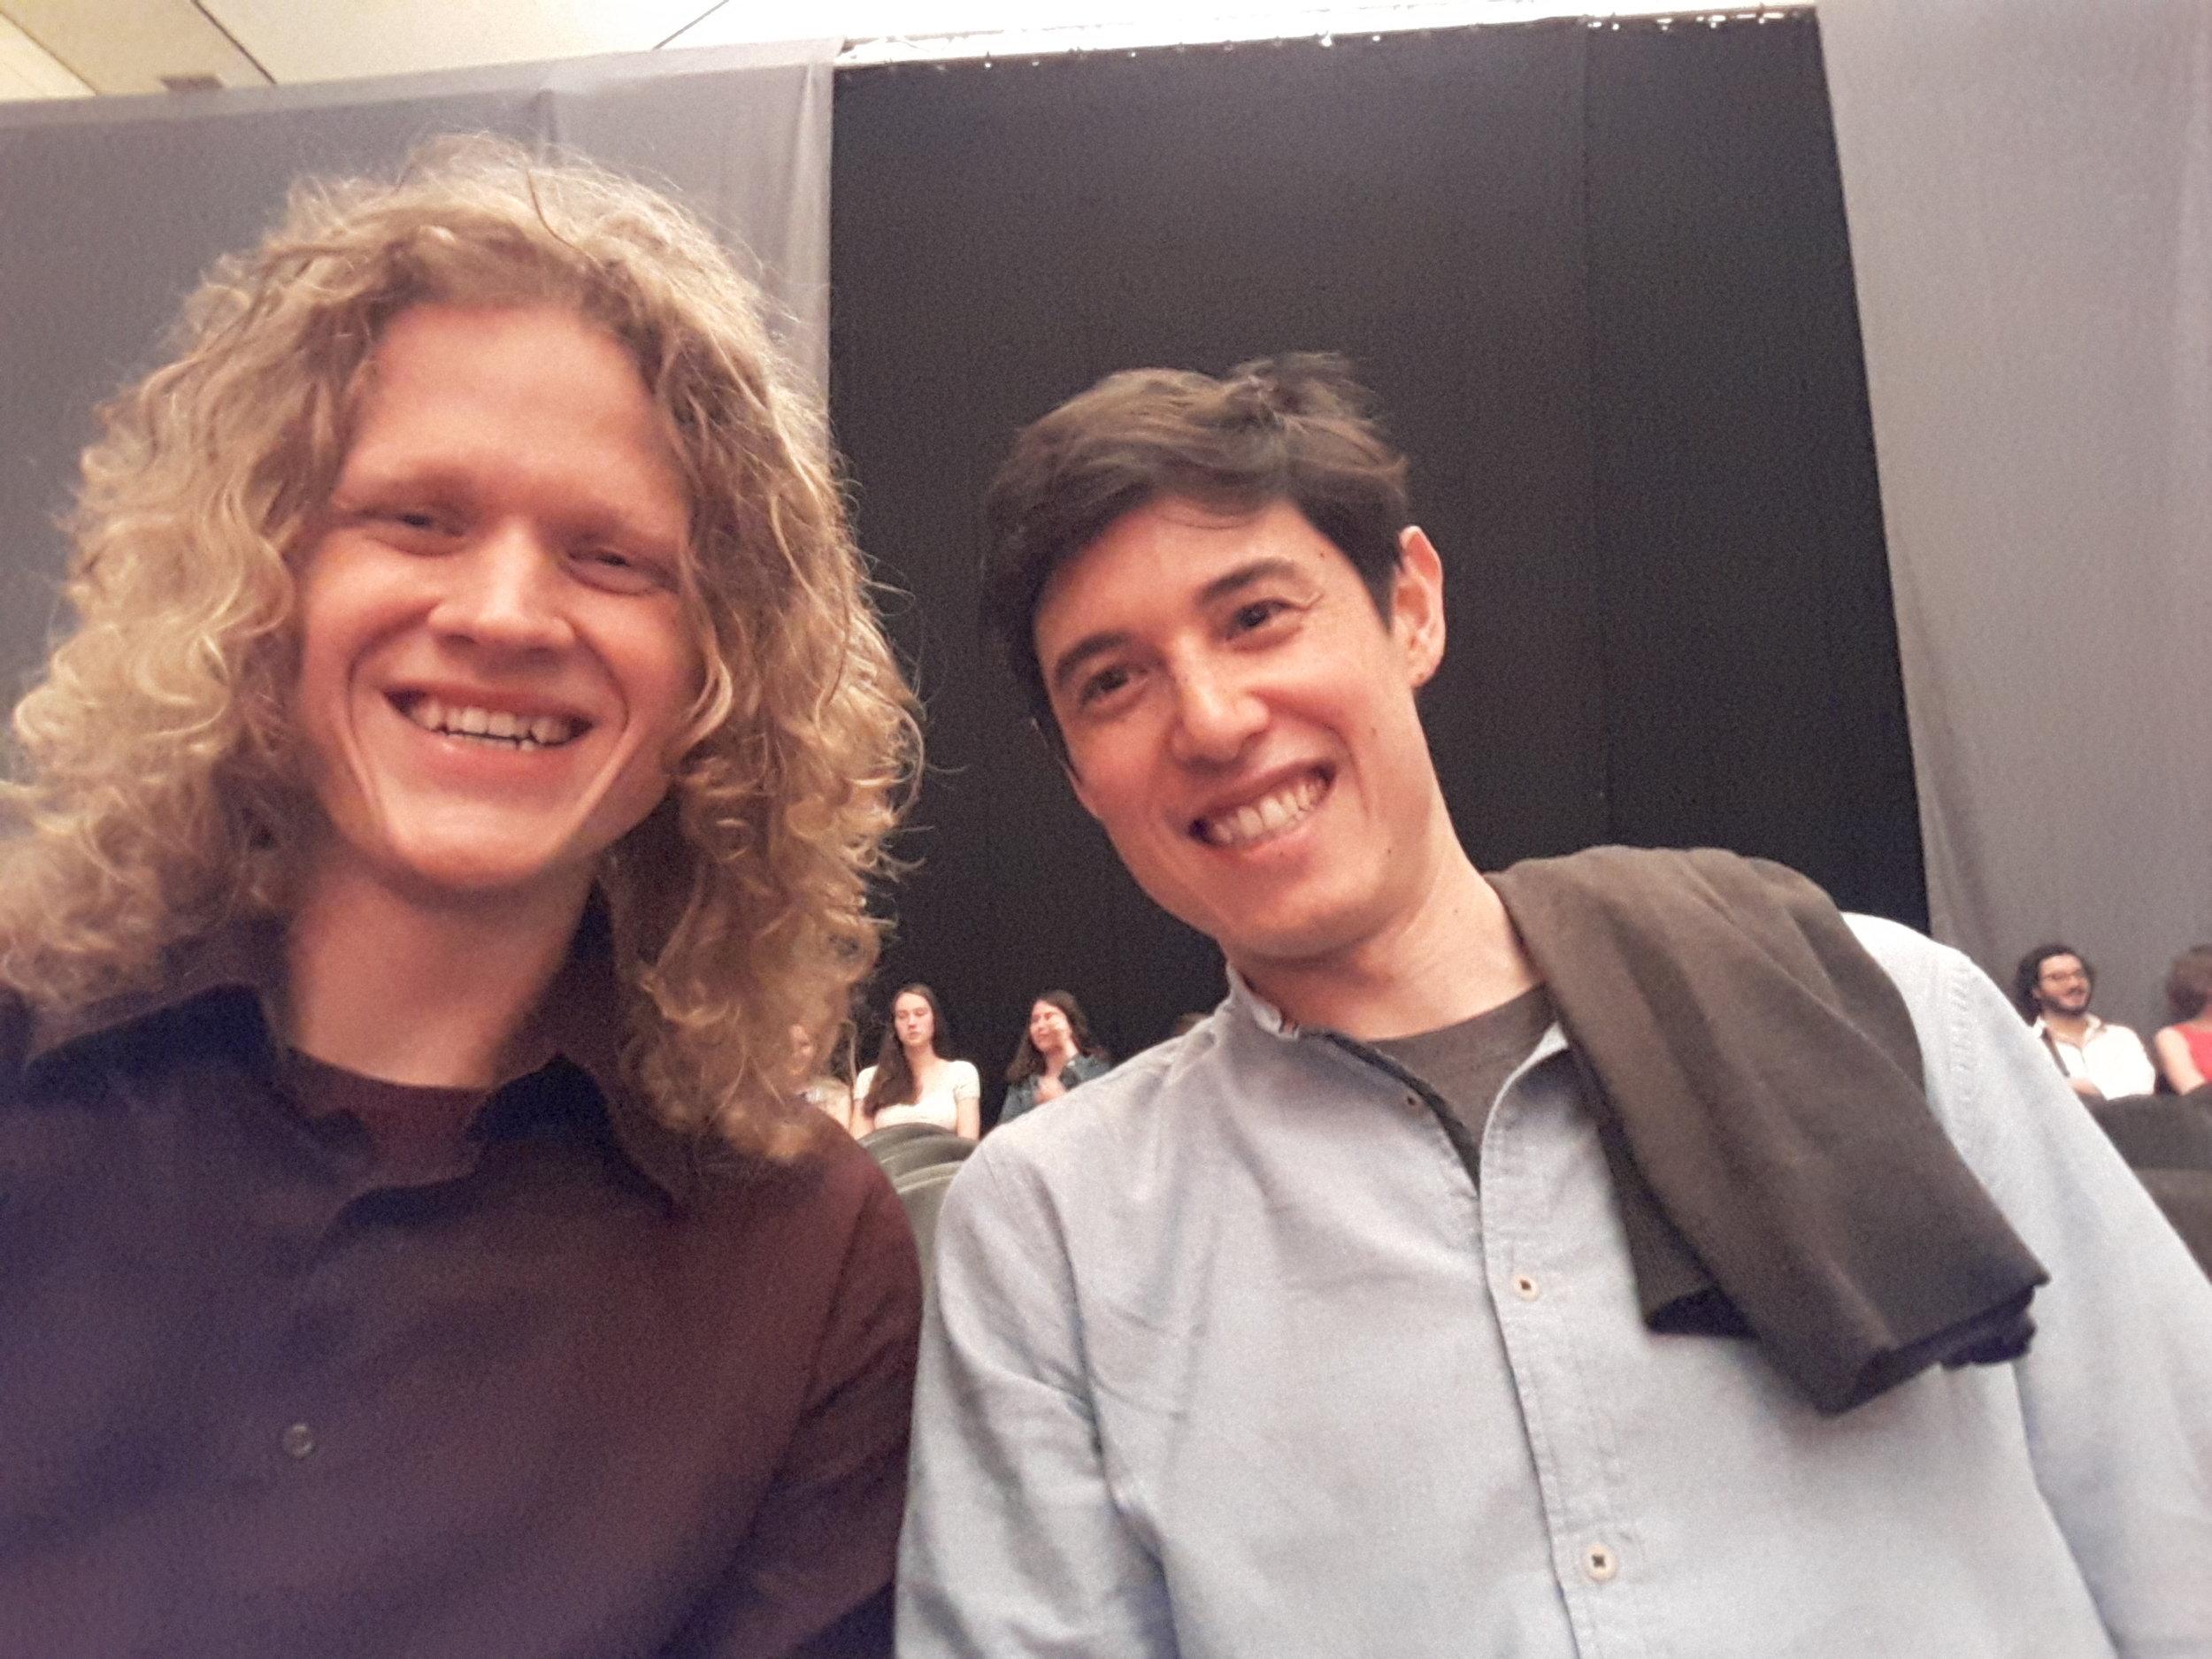 With fellow young American guitarbuilder Michael Cadiz.